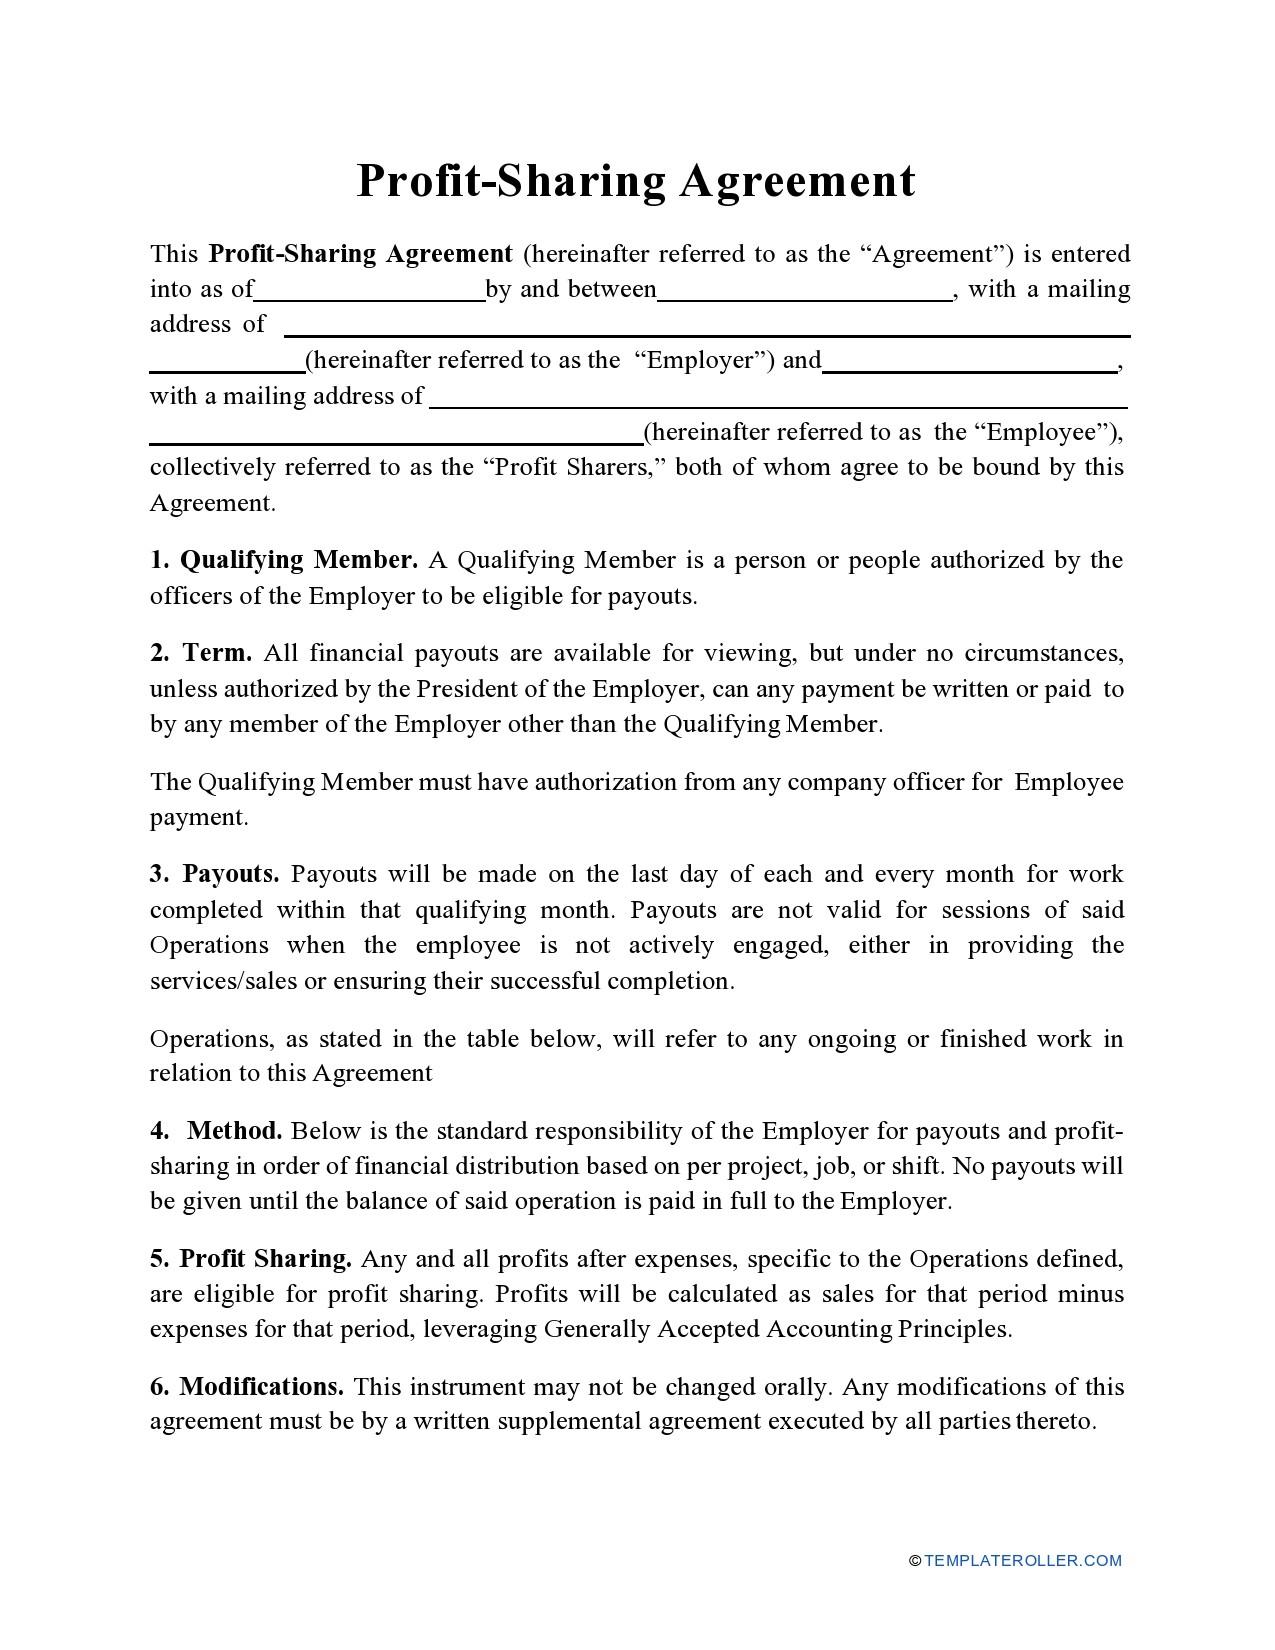 Free profit sharing agreement 12